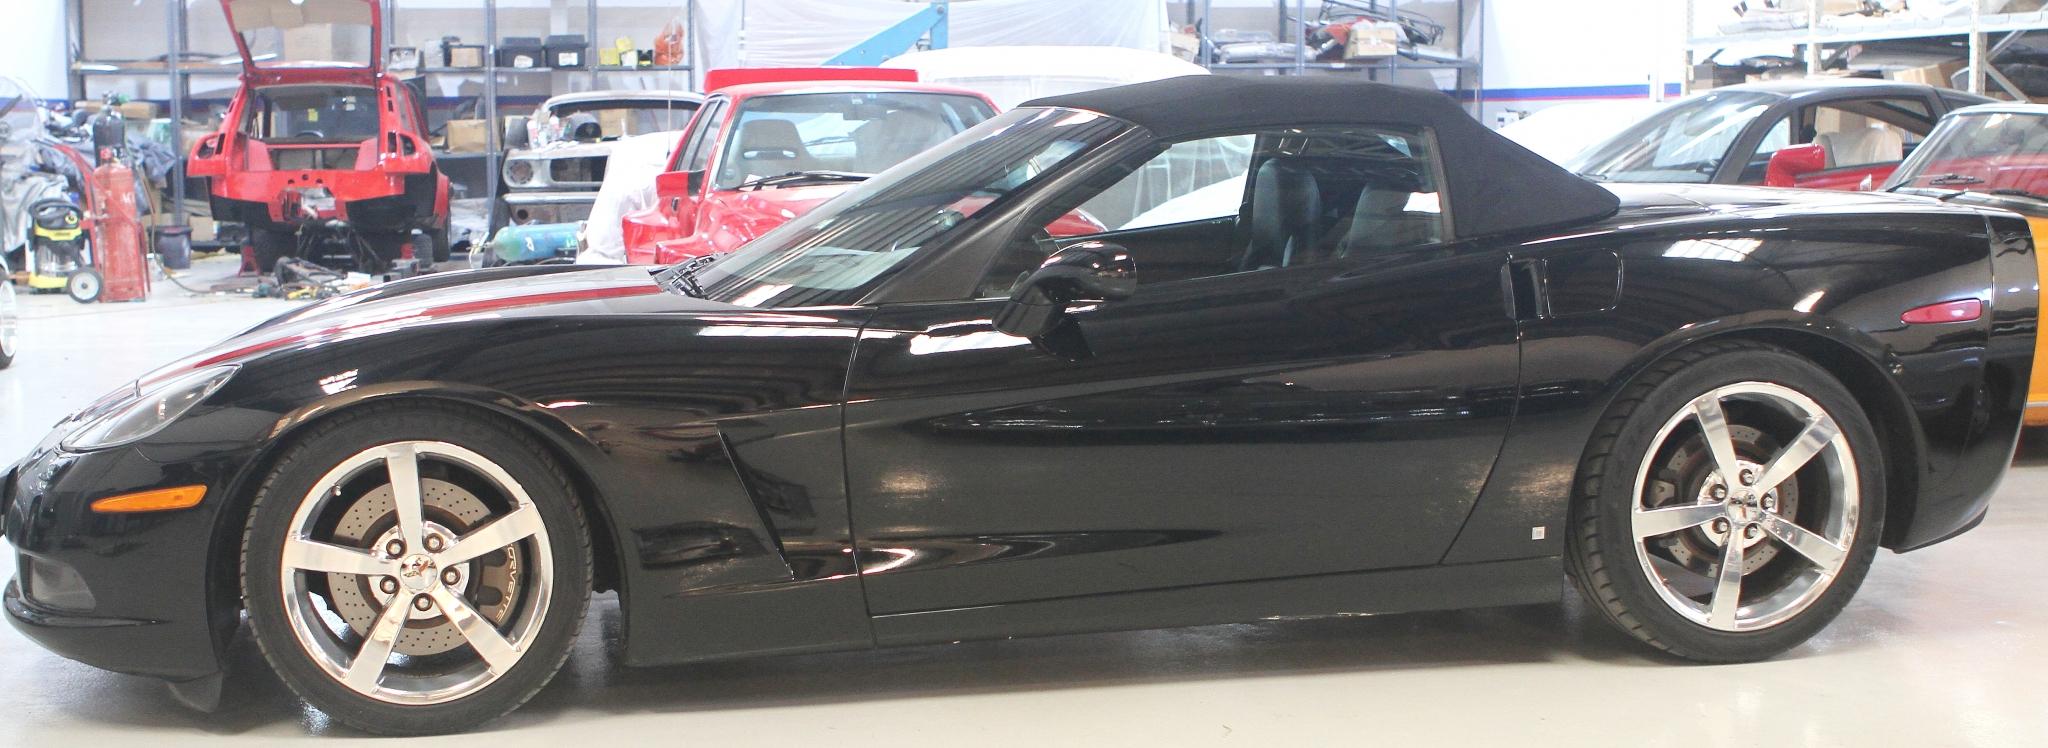 Chevrolet Corvette C6 | The Motor Company Trading LLC